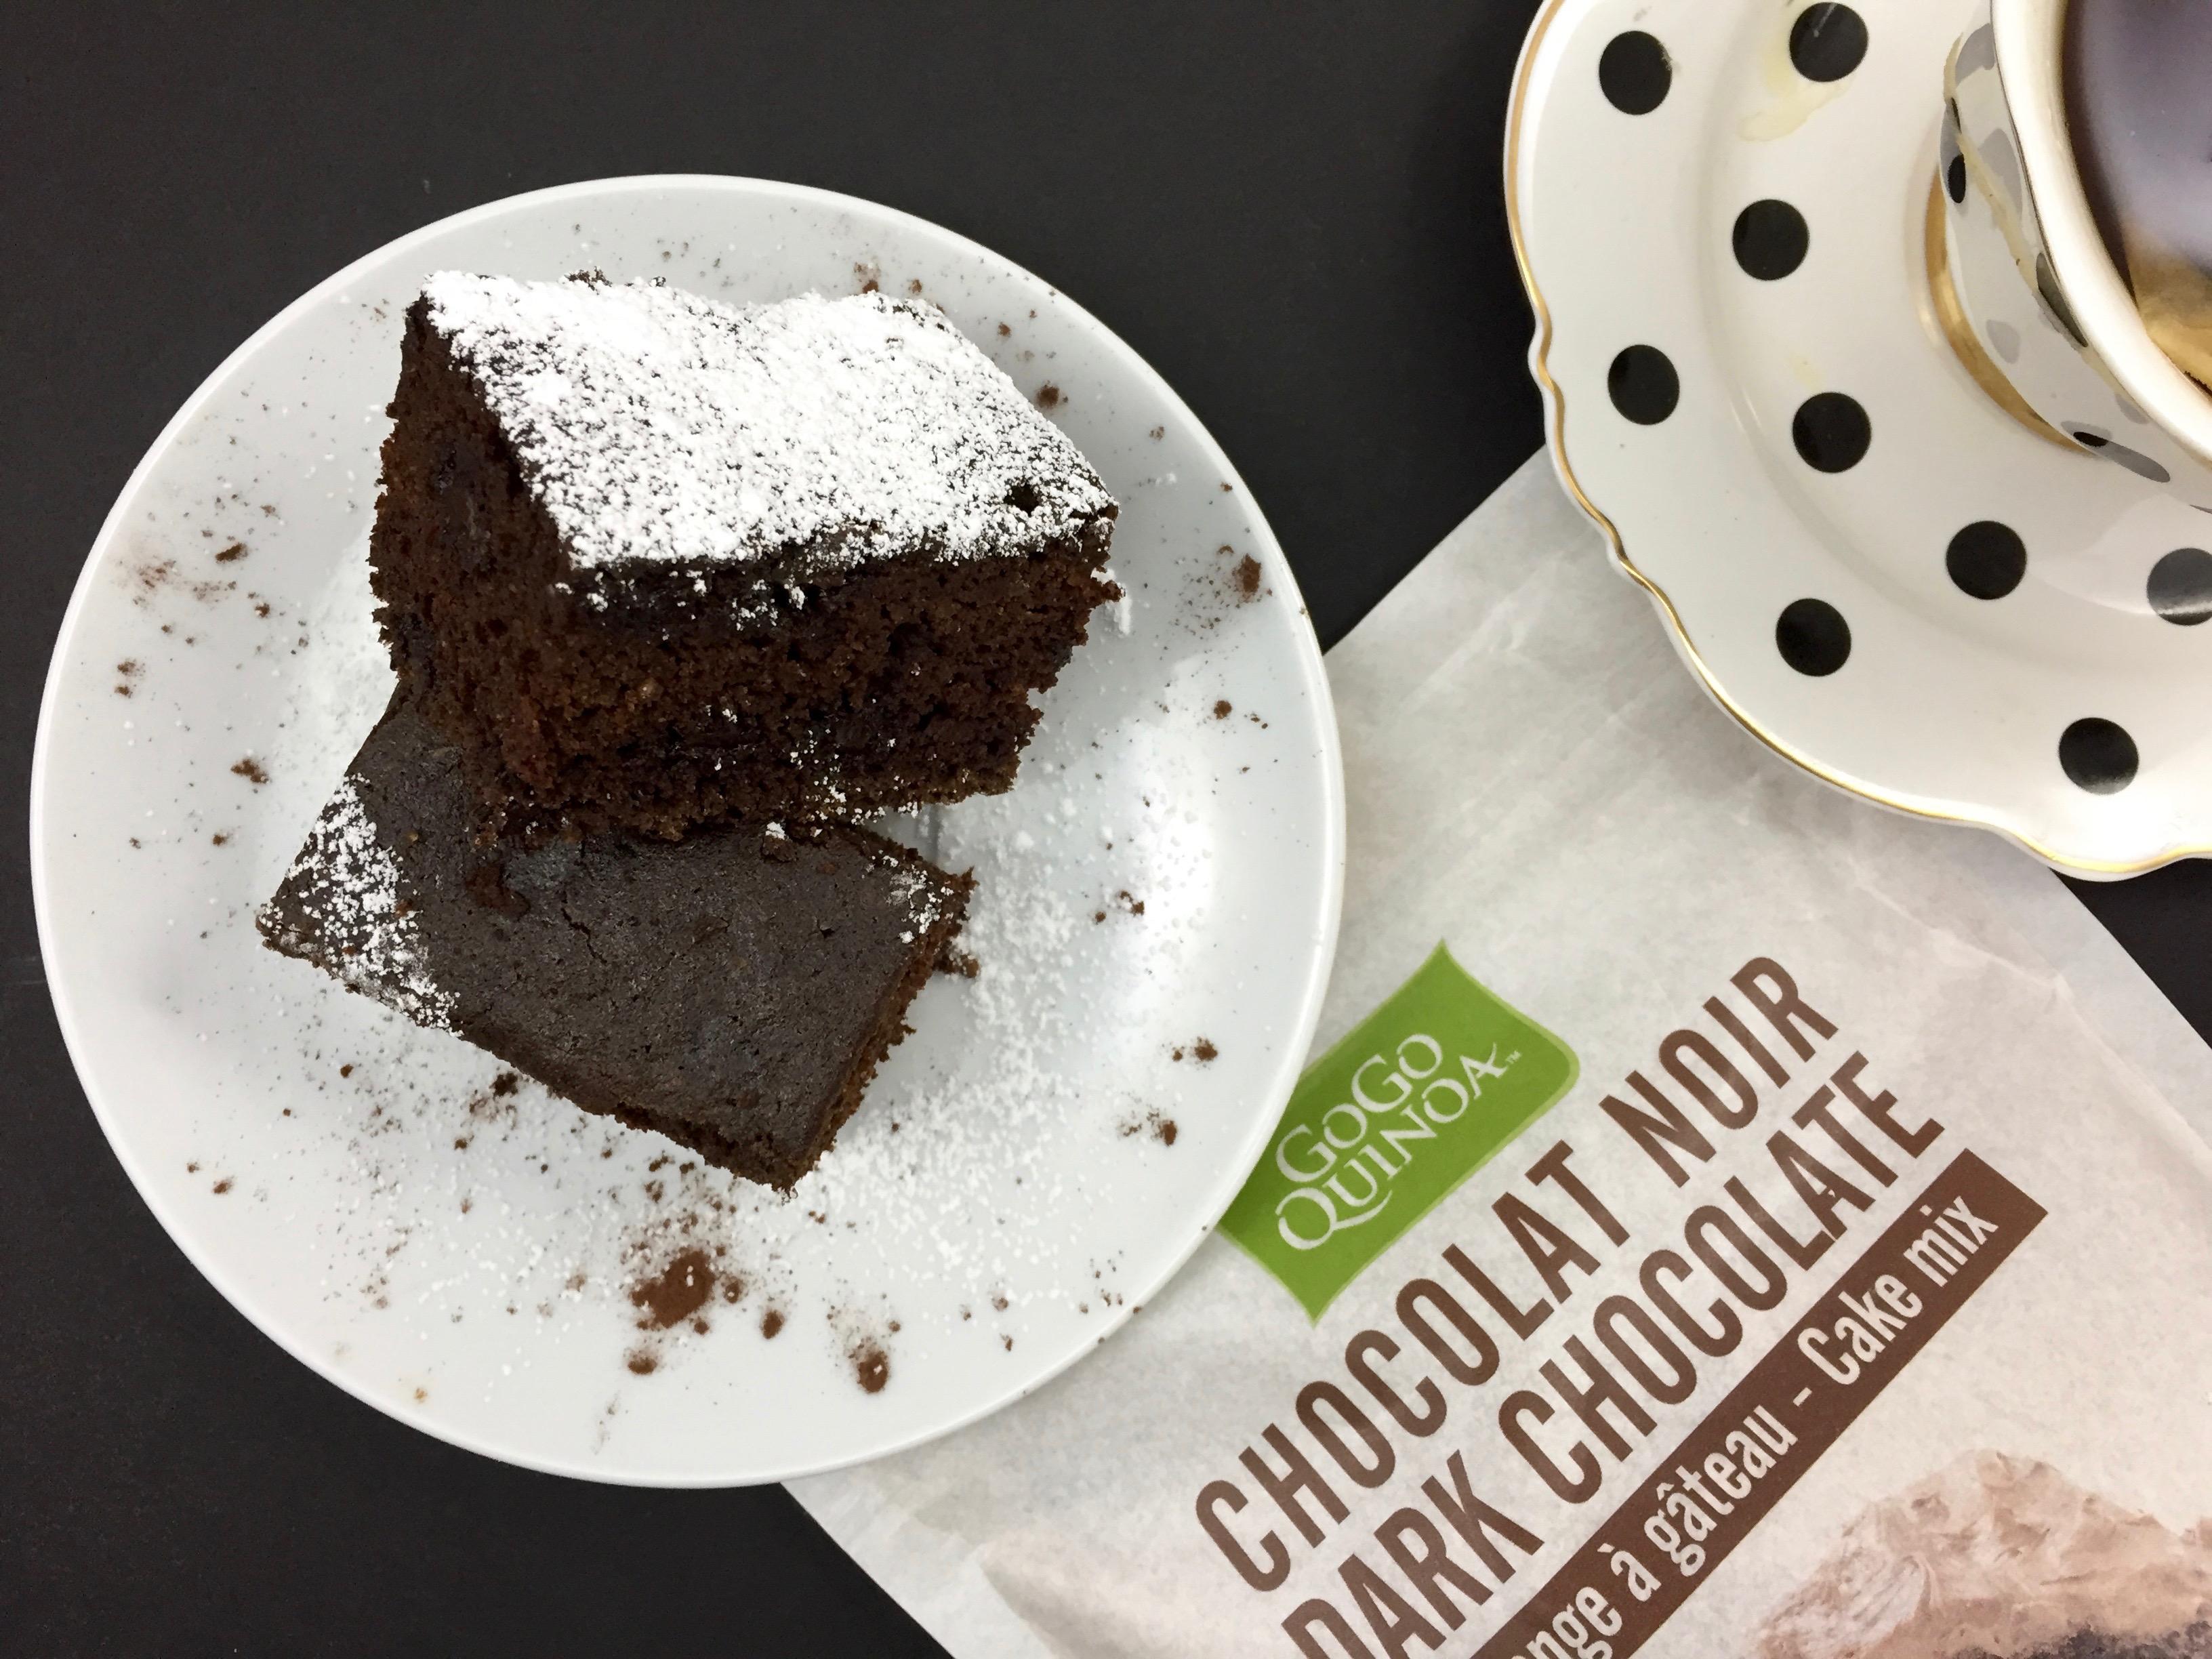 Gluten Free Chocolate Cake + GoGo Quinoa Giveaway